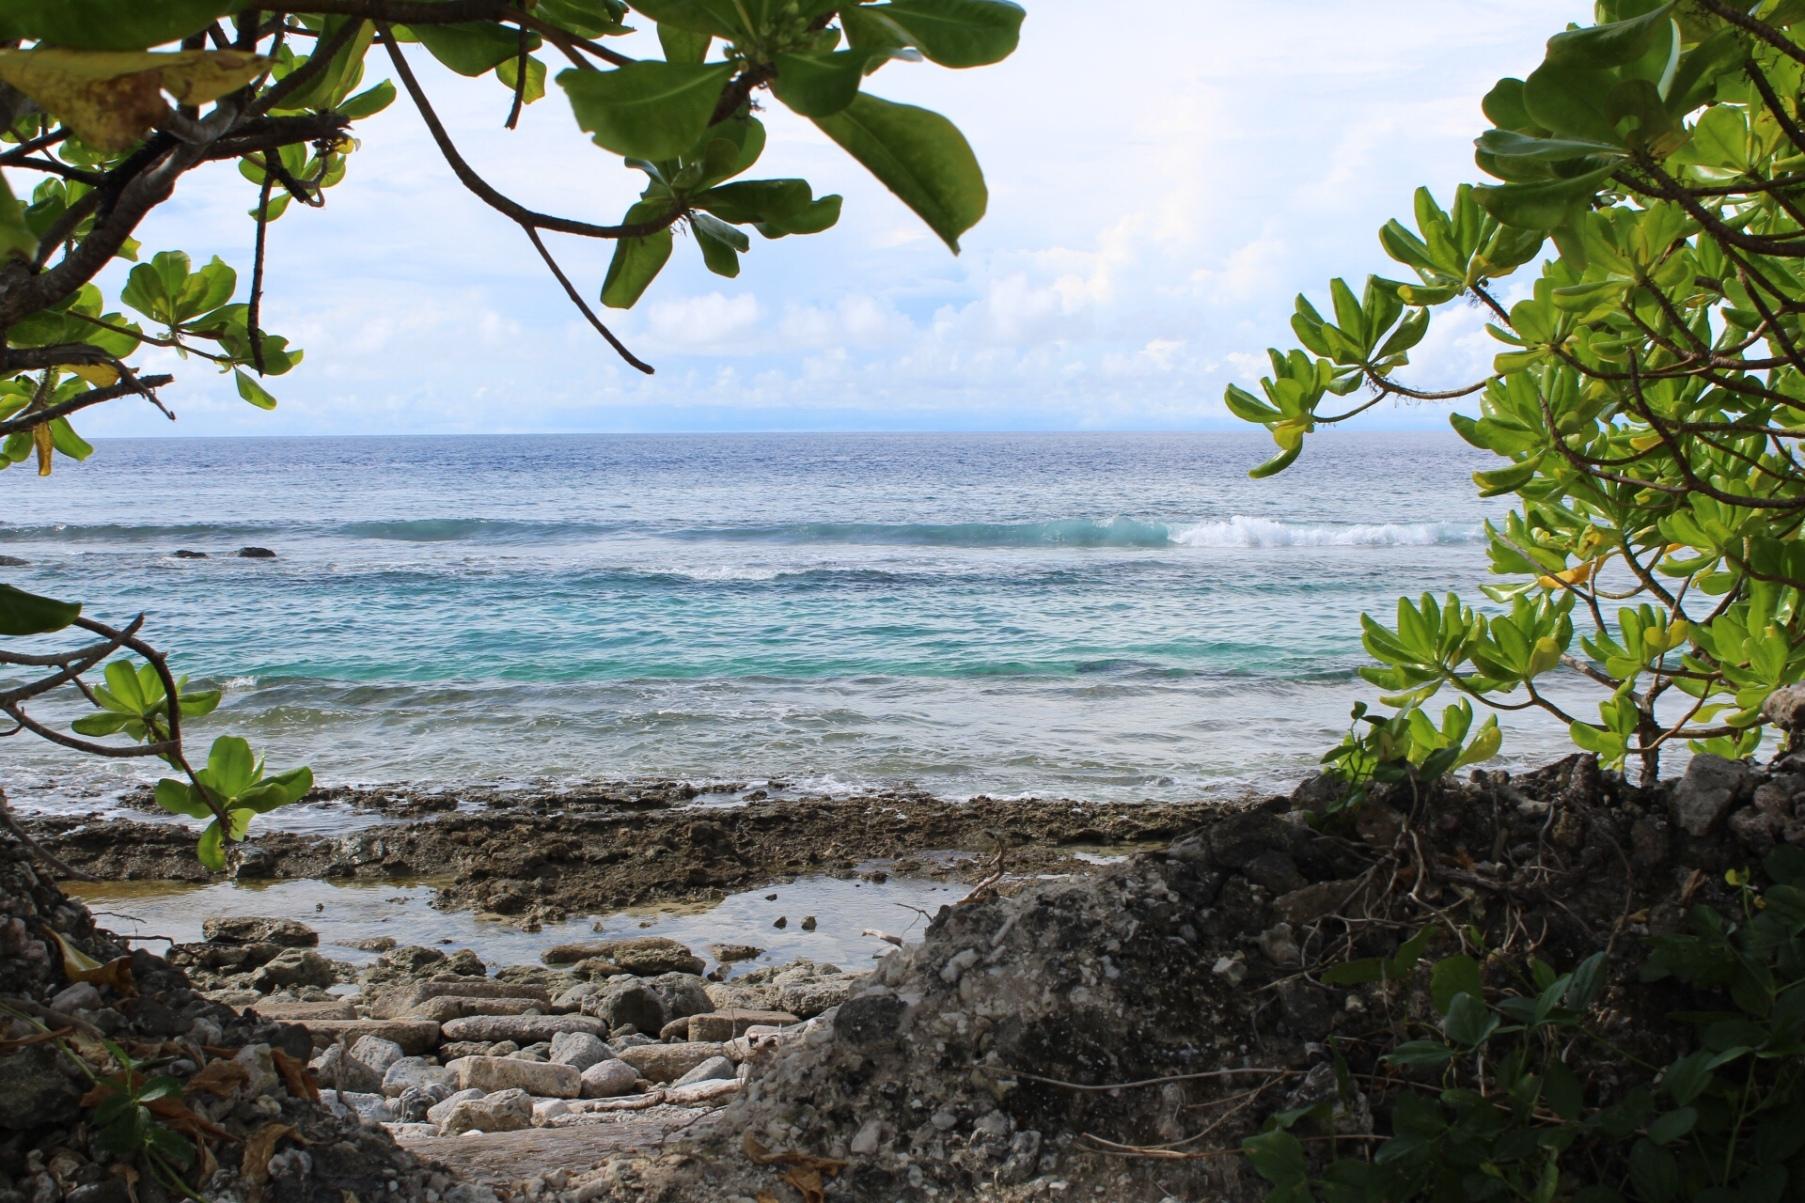 Ocean view from Kwajalein